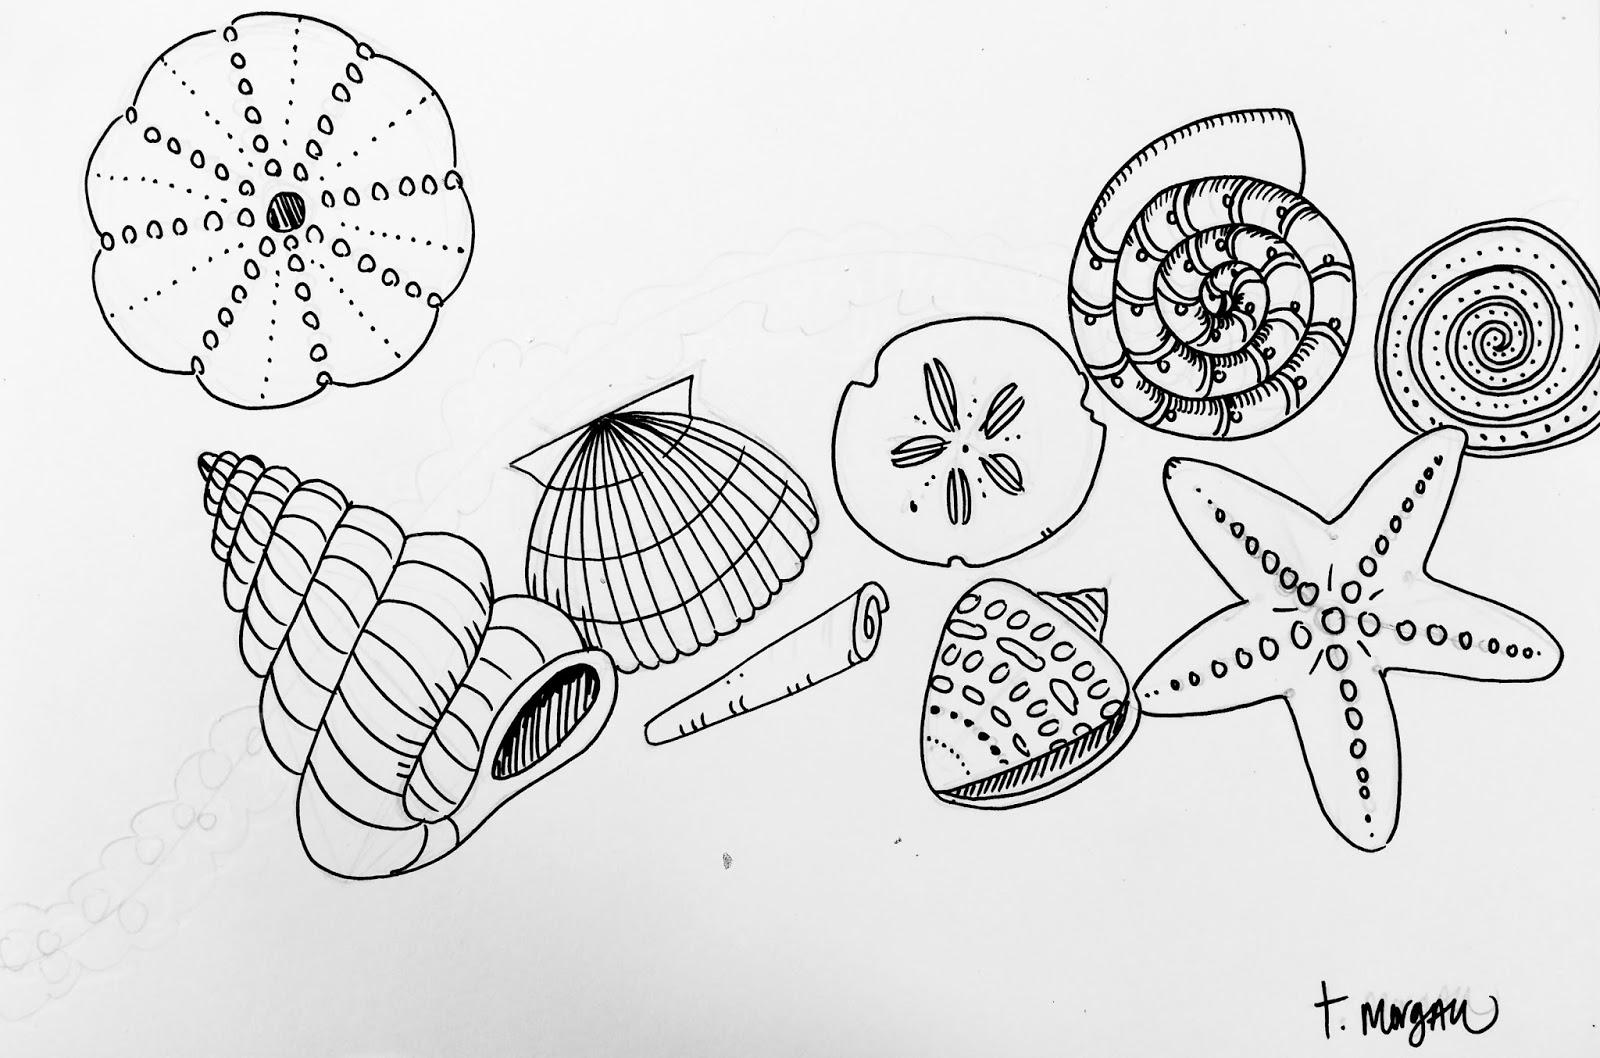 The Lost Sock Seashells By The Seashore